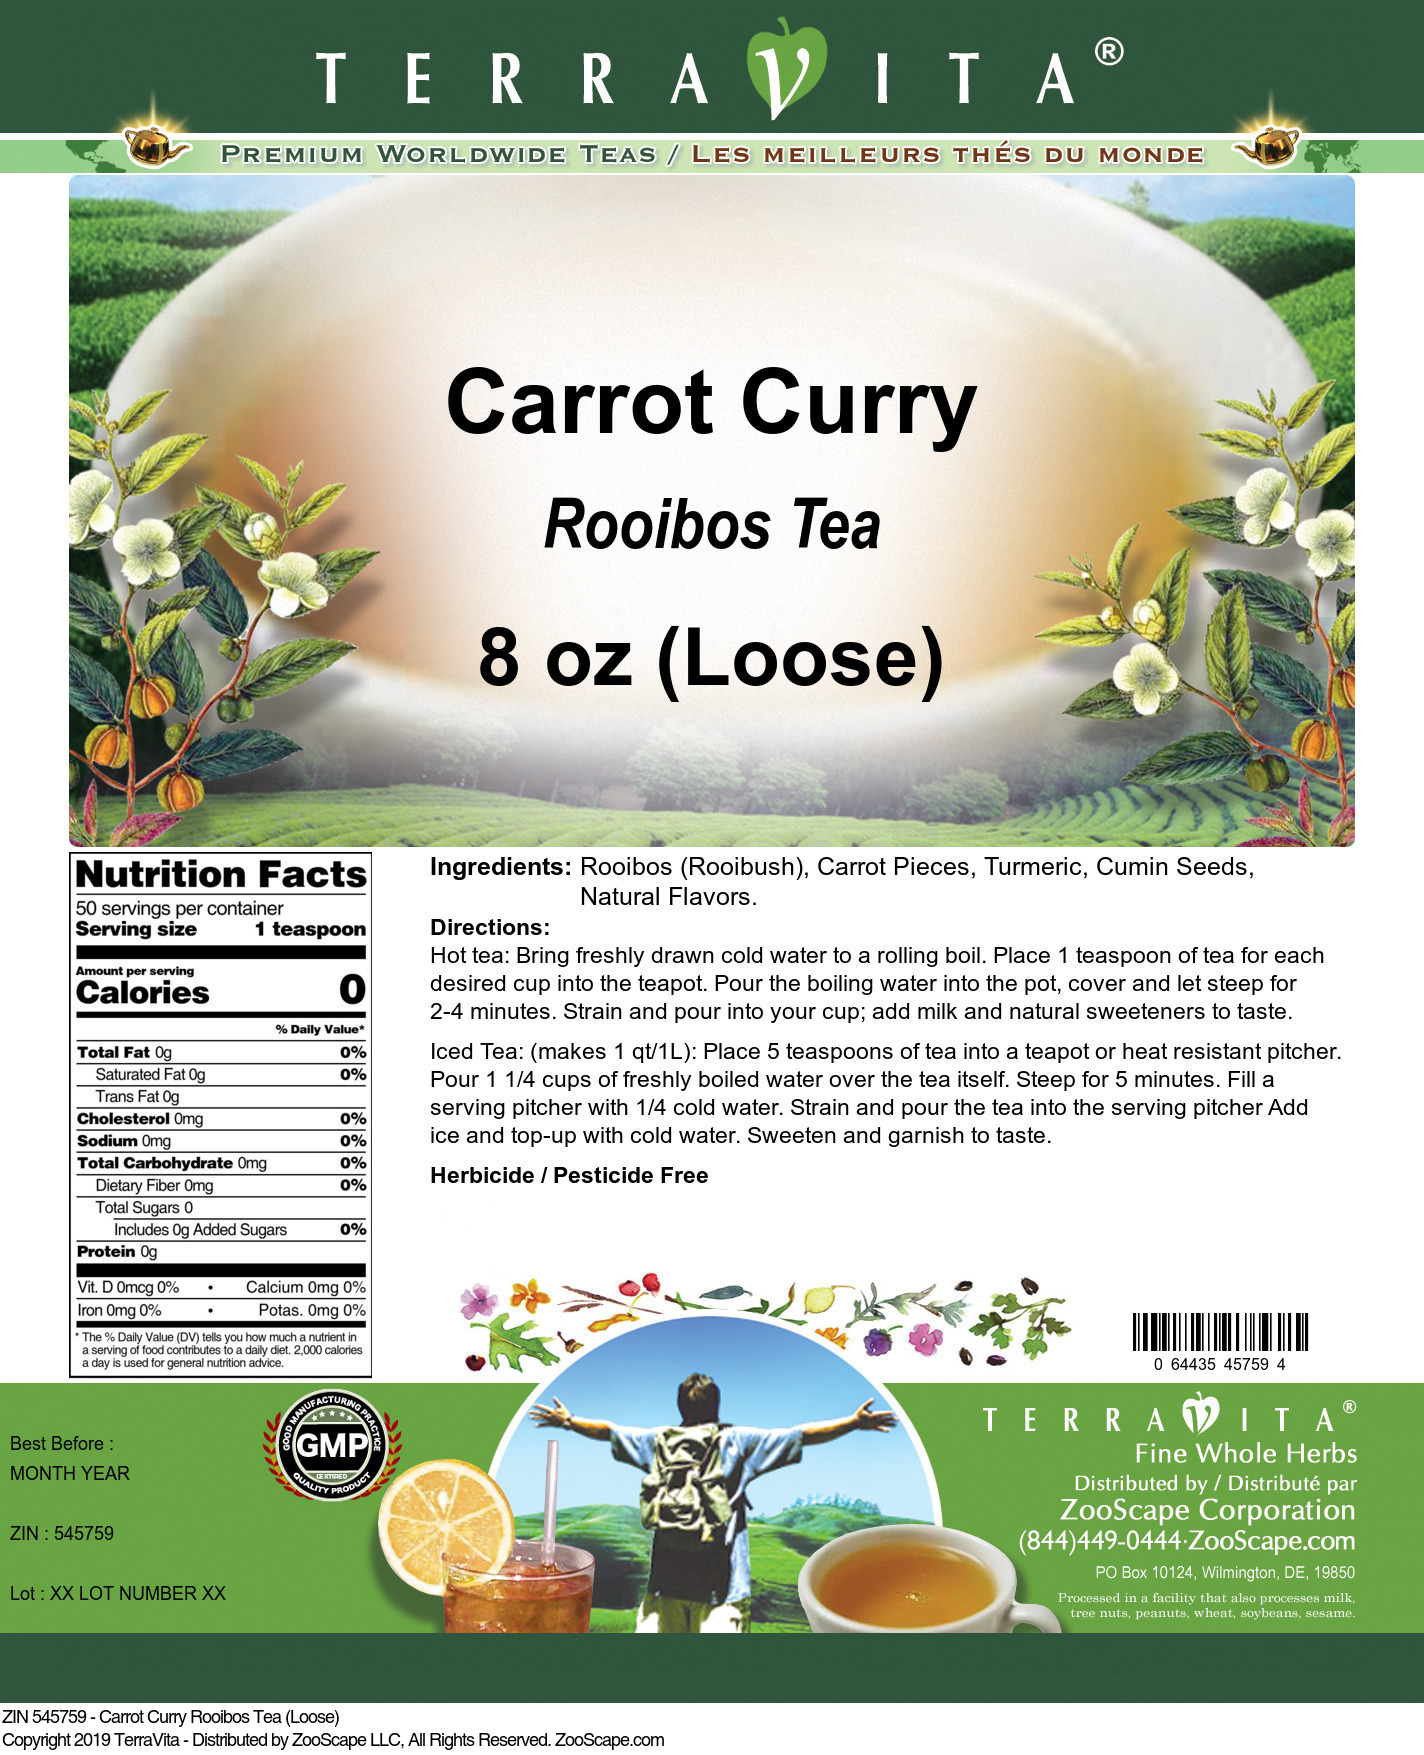 Carrot Curry Rooibos Tea (Loose)